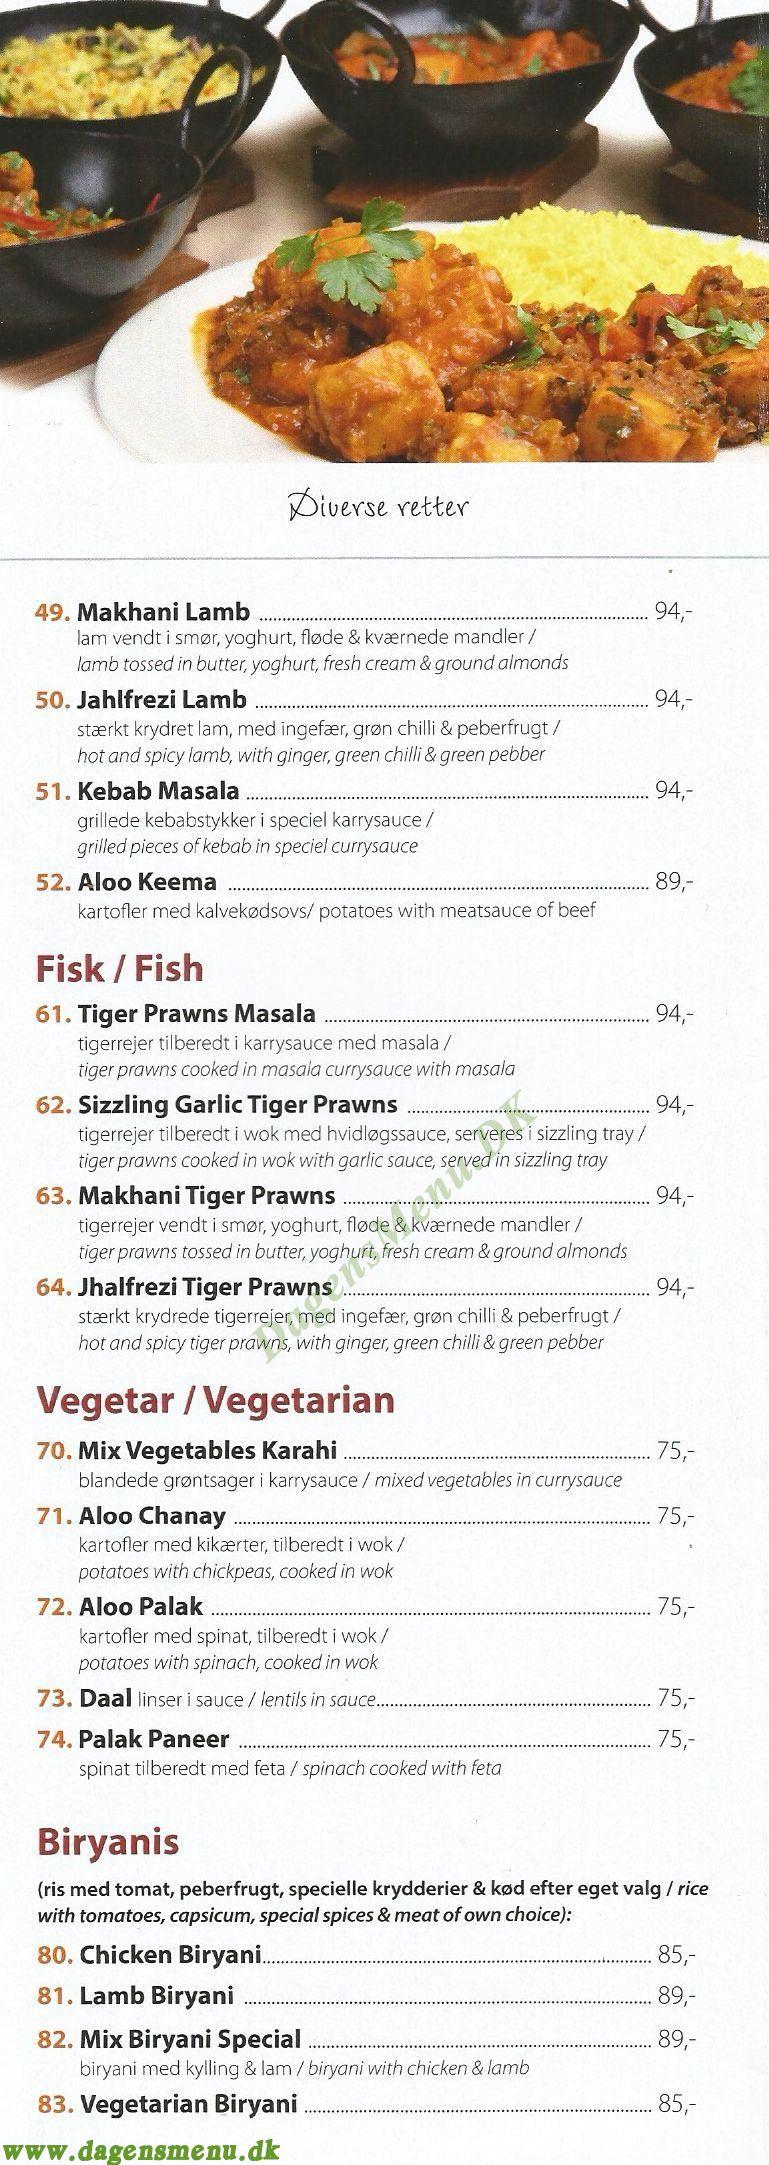 Restaurant Kebabish - Menukort